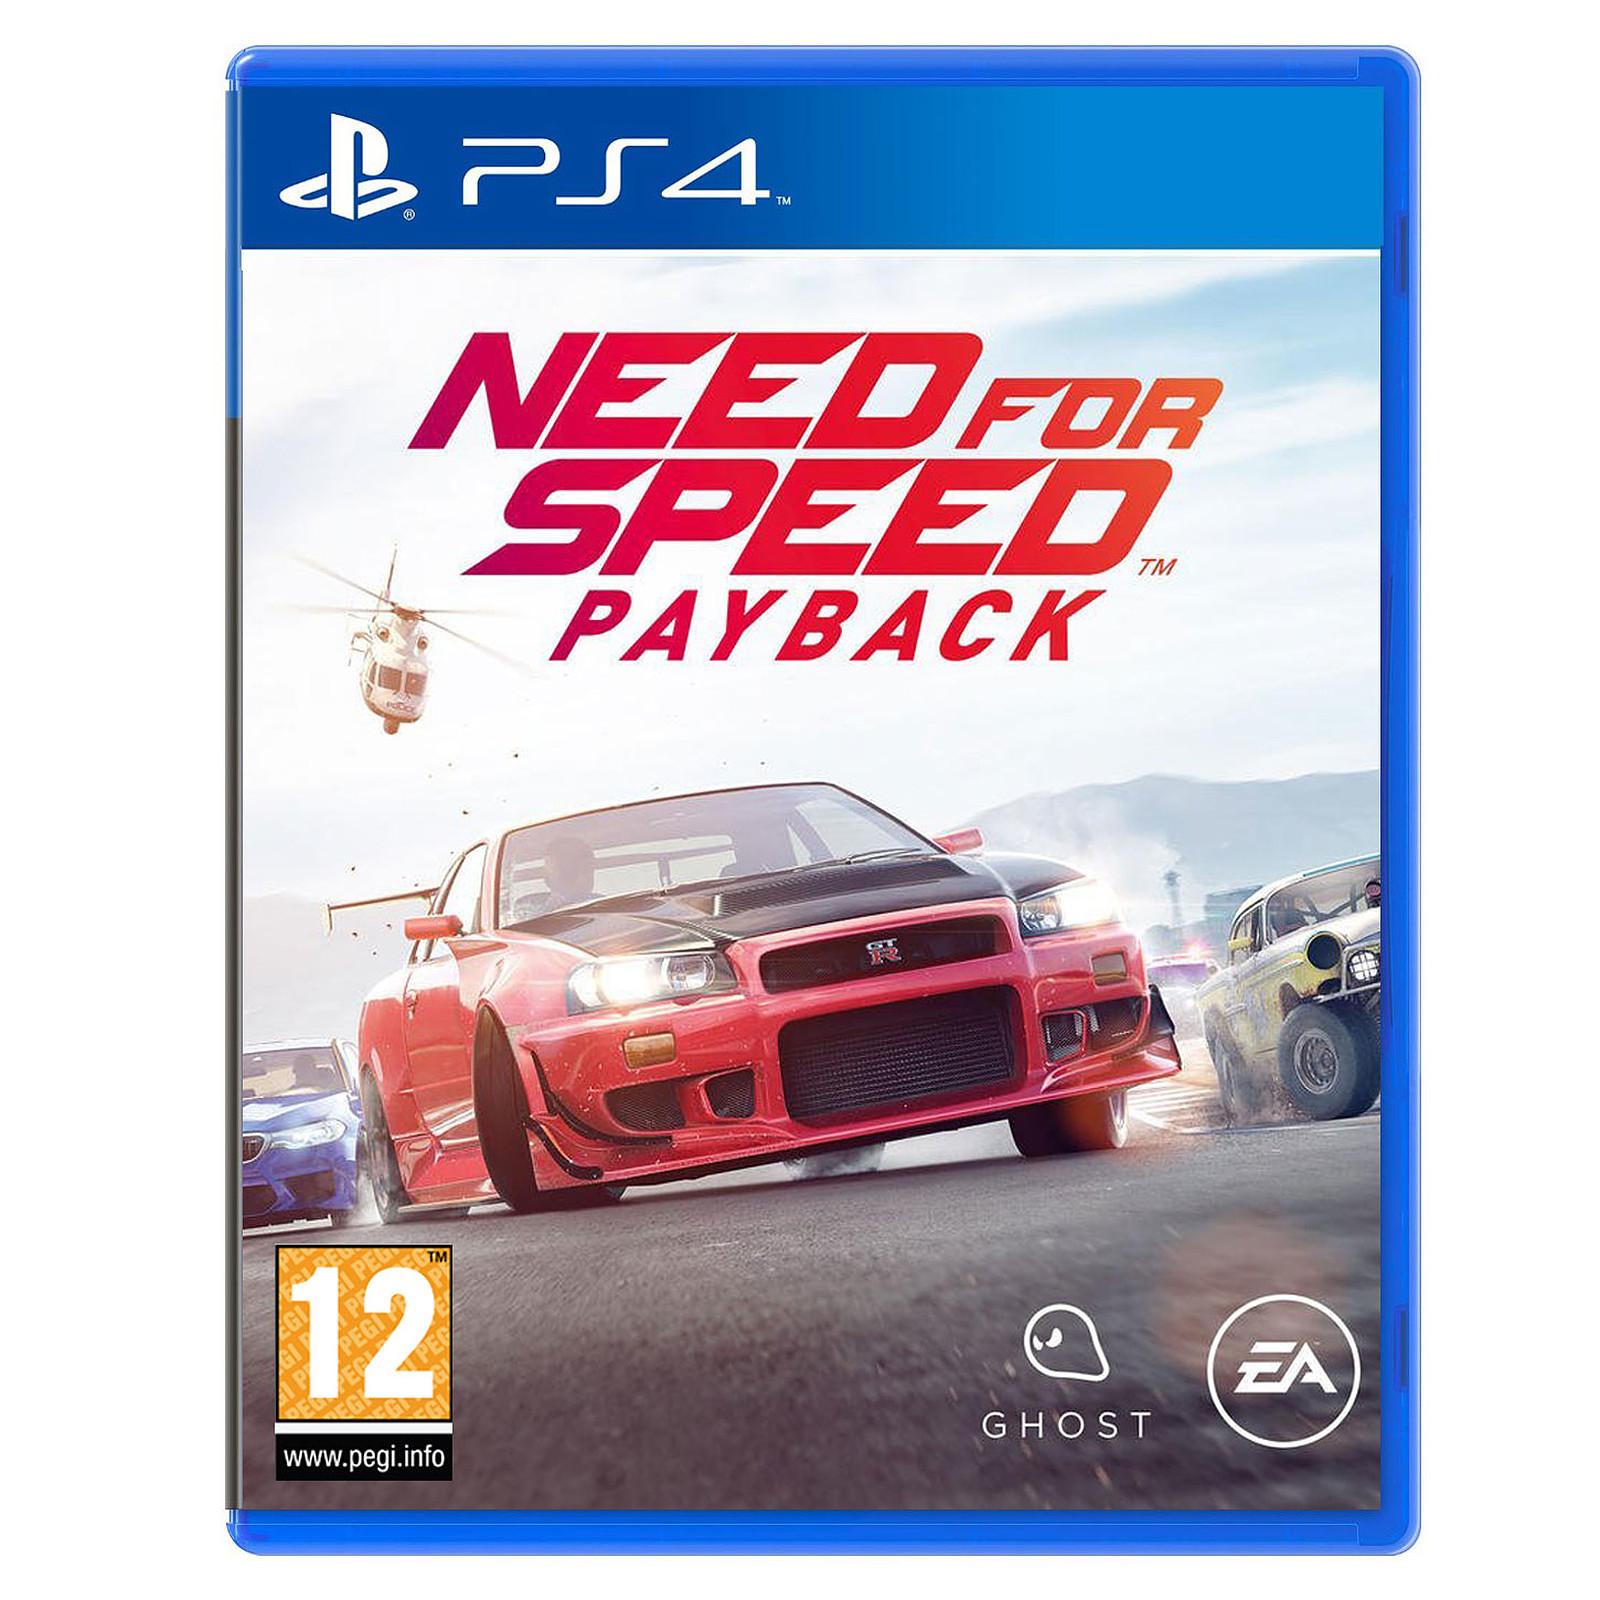 Need For Speed Payback sur PS4 (Dématérialisé)